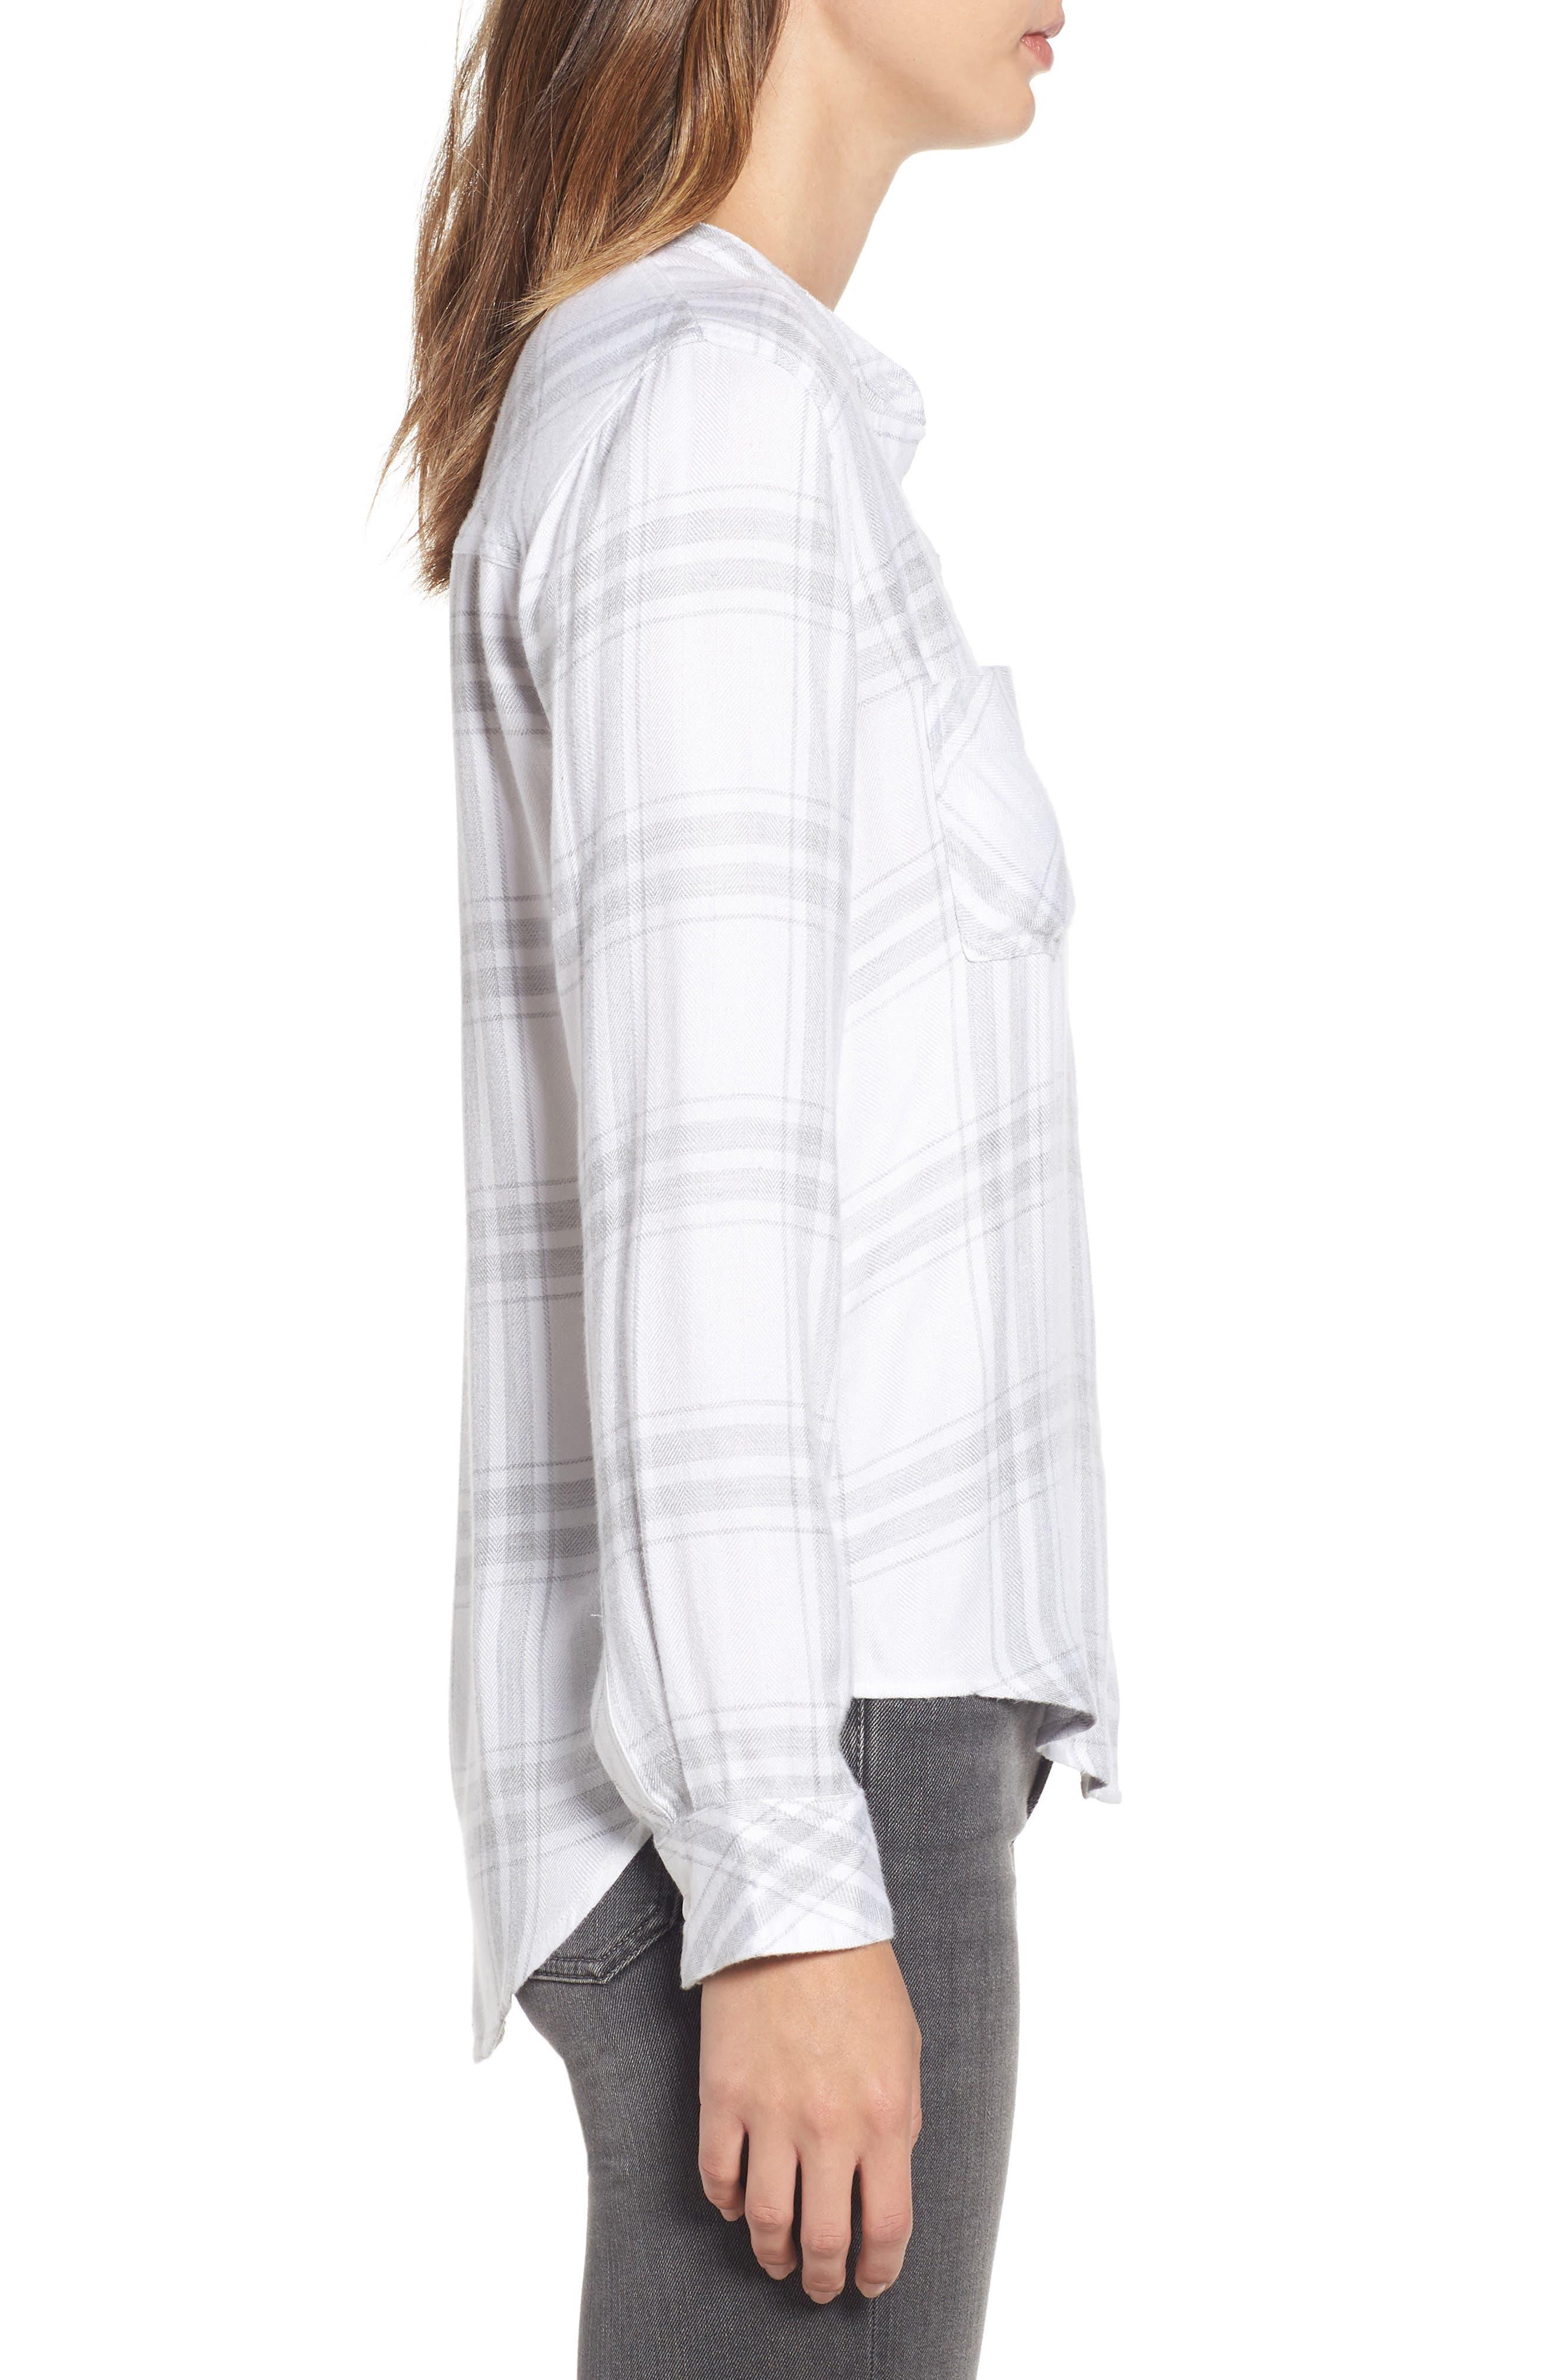 Allison Plaid Shirt,                             Alternate thumbnail 3, color,                             WHITE SILVER